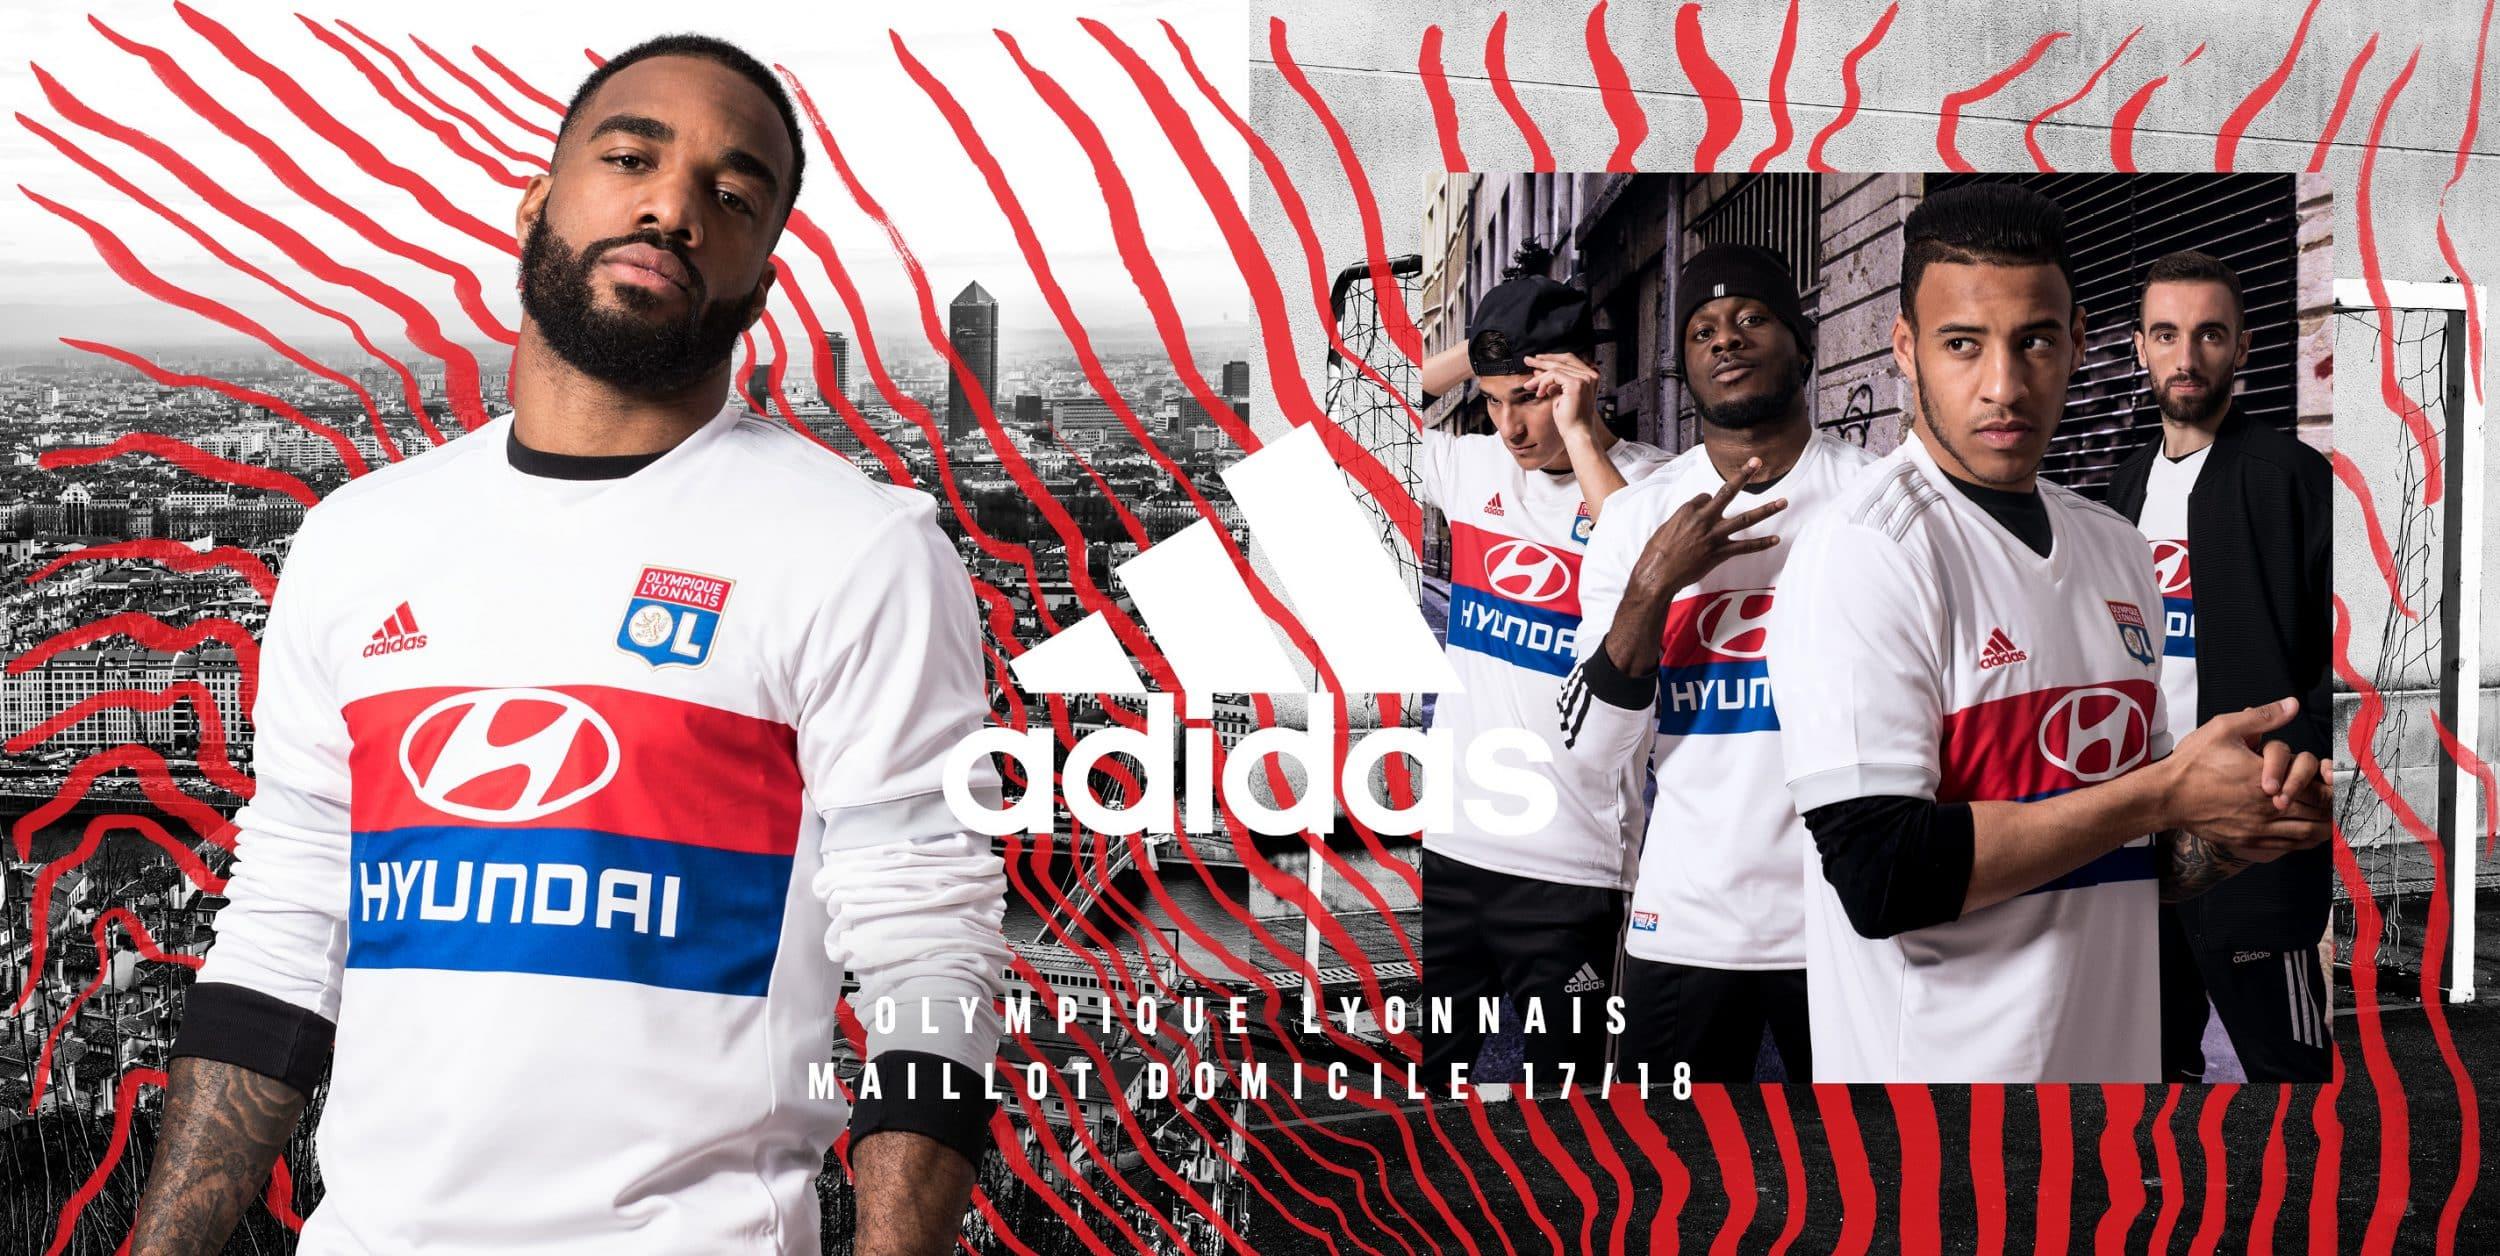 Maillot Olympique Lyonnais 2018